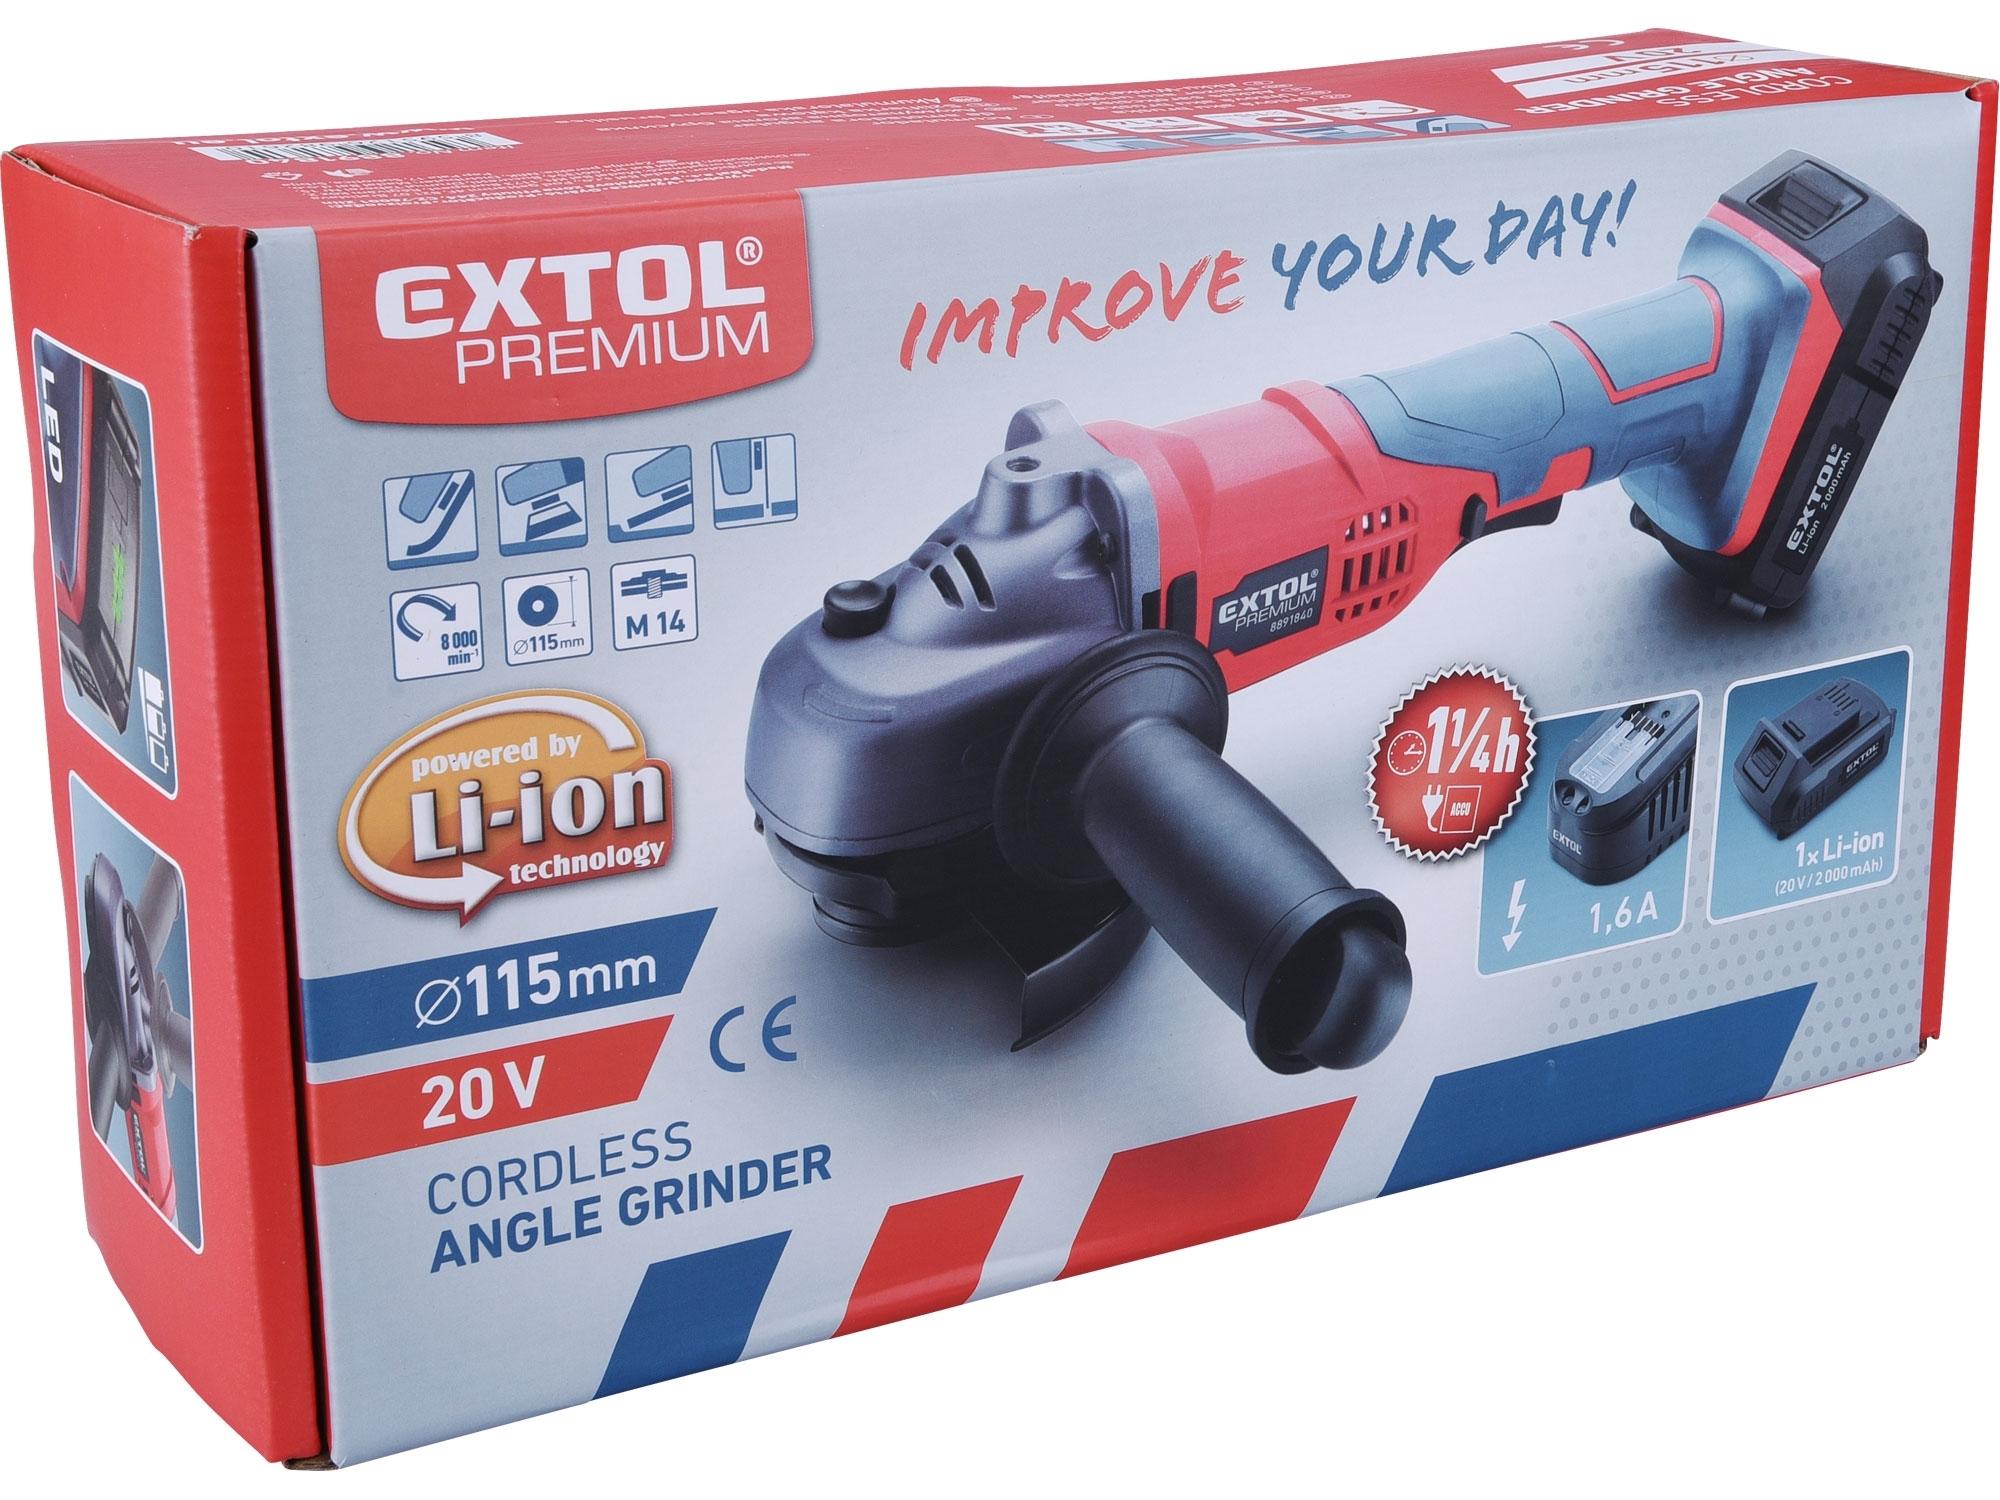 EXTOL PREMIUM bruska úhlová aku SHARE20V, 115mm, 20V Li-ion, 2000mAh 8891840